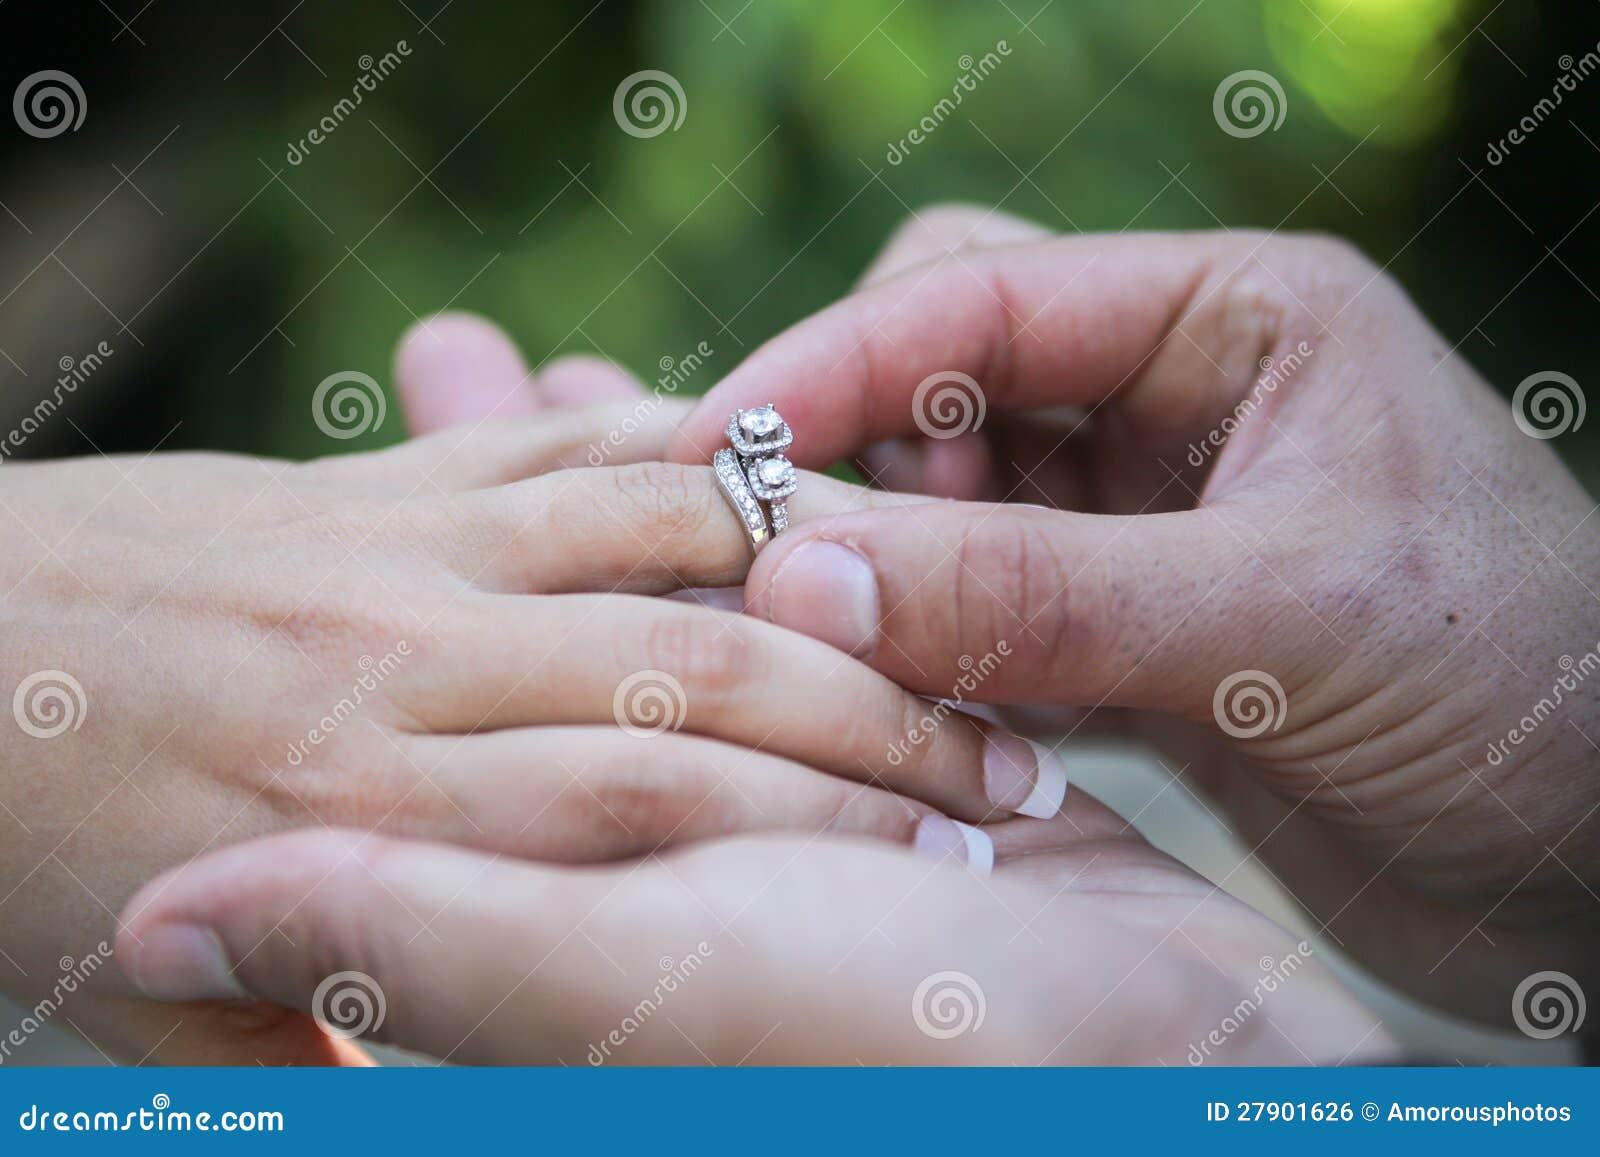 Placing Wedding Ring On Finger Royalty Free Stock Image